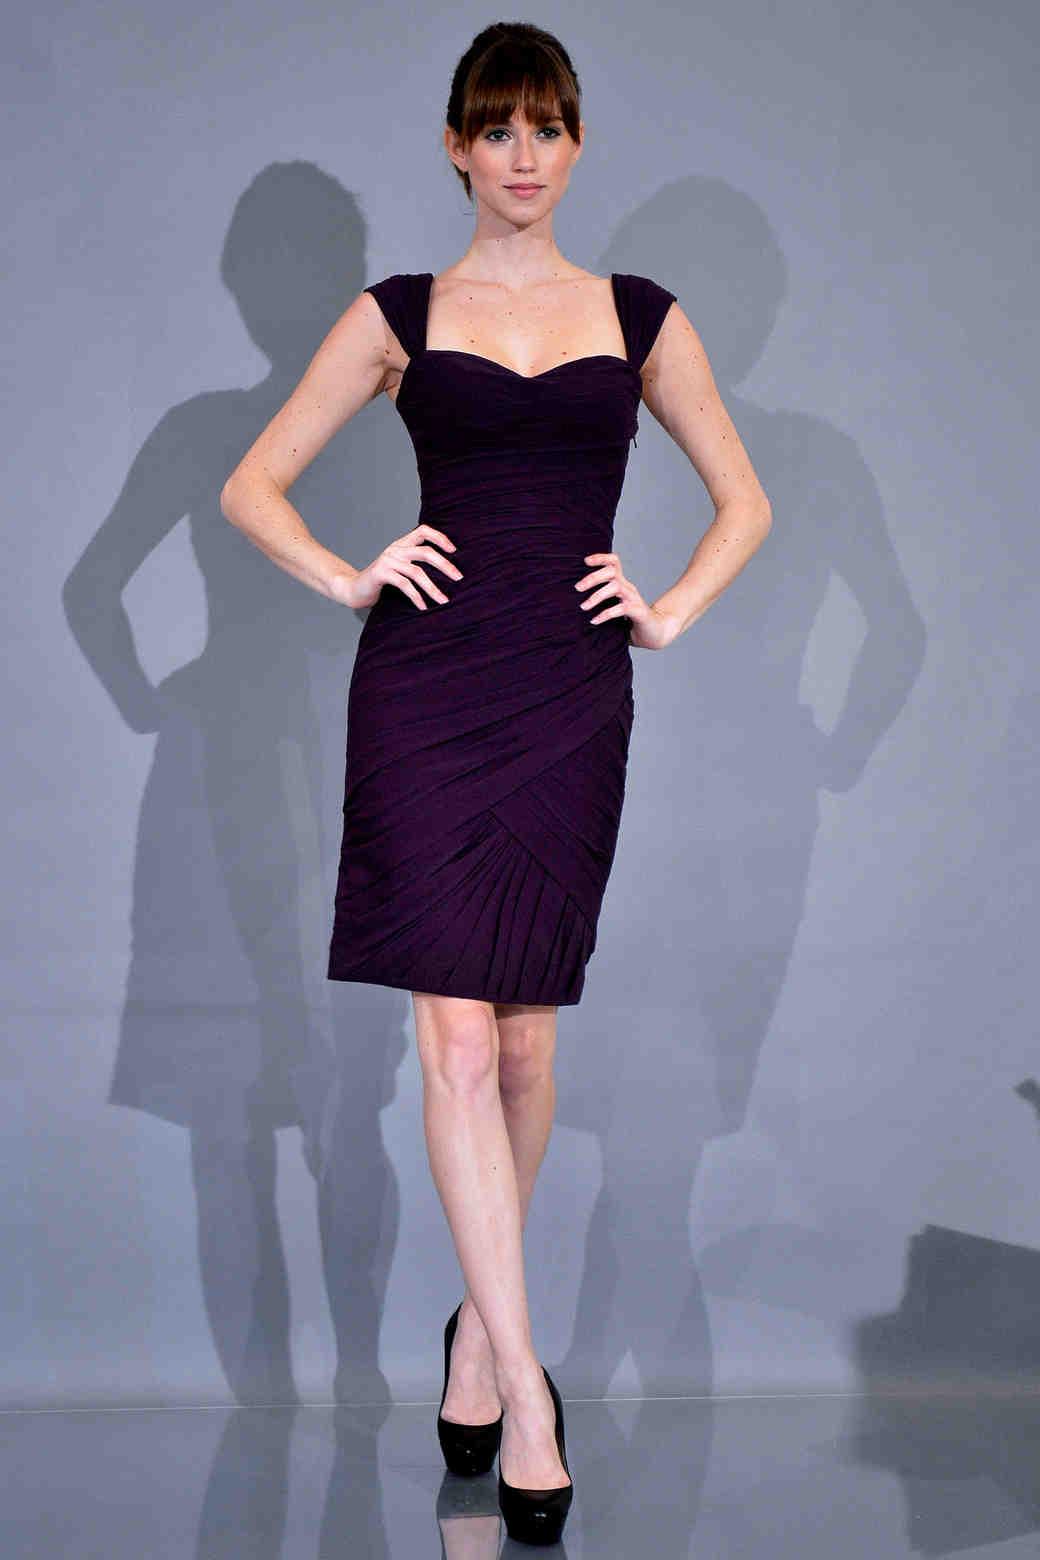 monique-lhuillier-bridesmaids-fall2012-wd108109-006-df.jpg